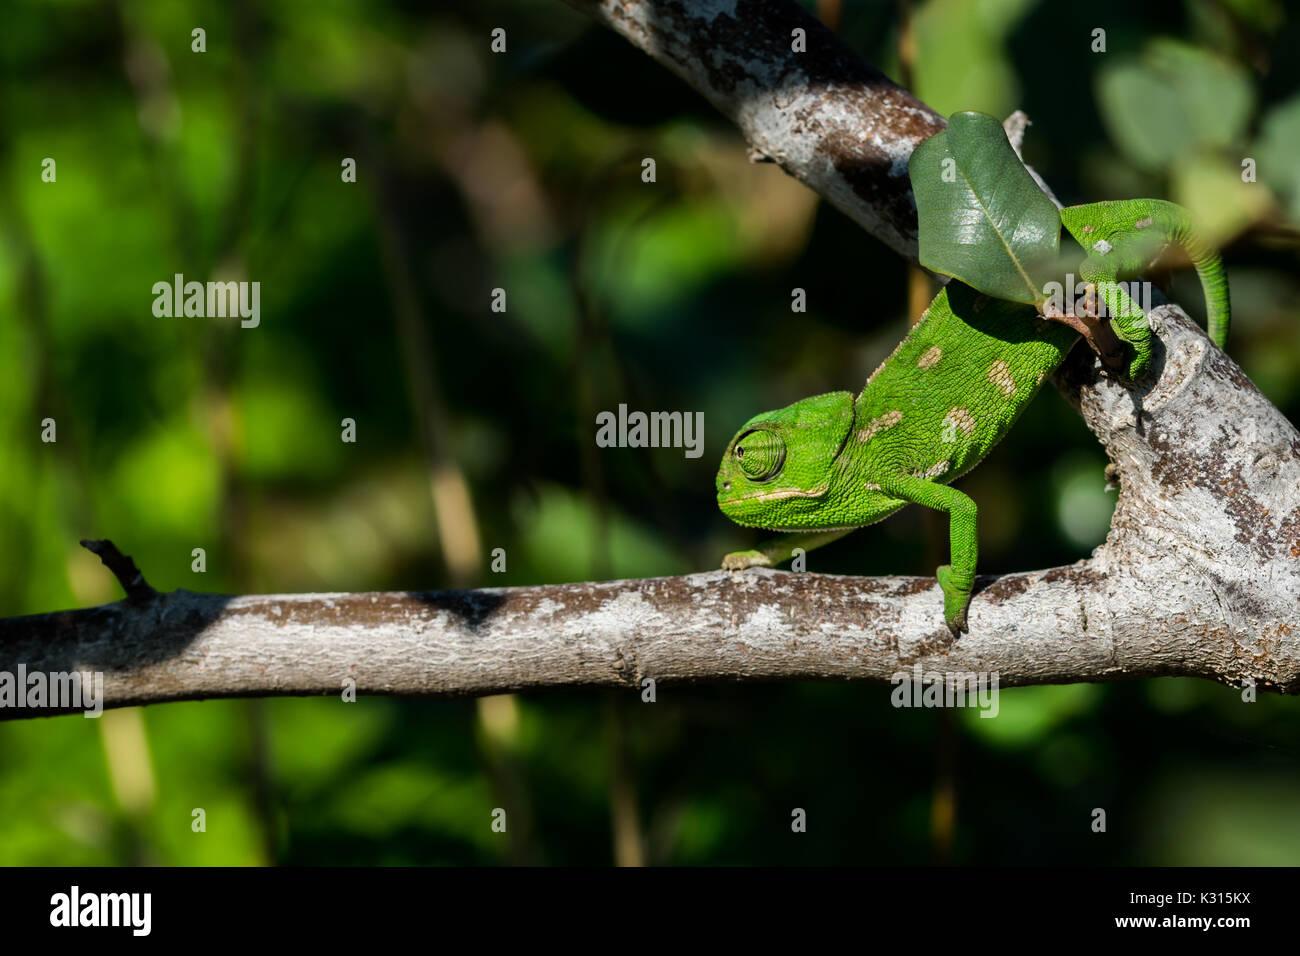 Ein Baby mediterrane Chameleon (Chamaeleo chamaeleon) langsam auf einem johannisbrotbaum Niederlassung in Malta. Stockbild